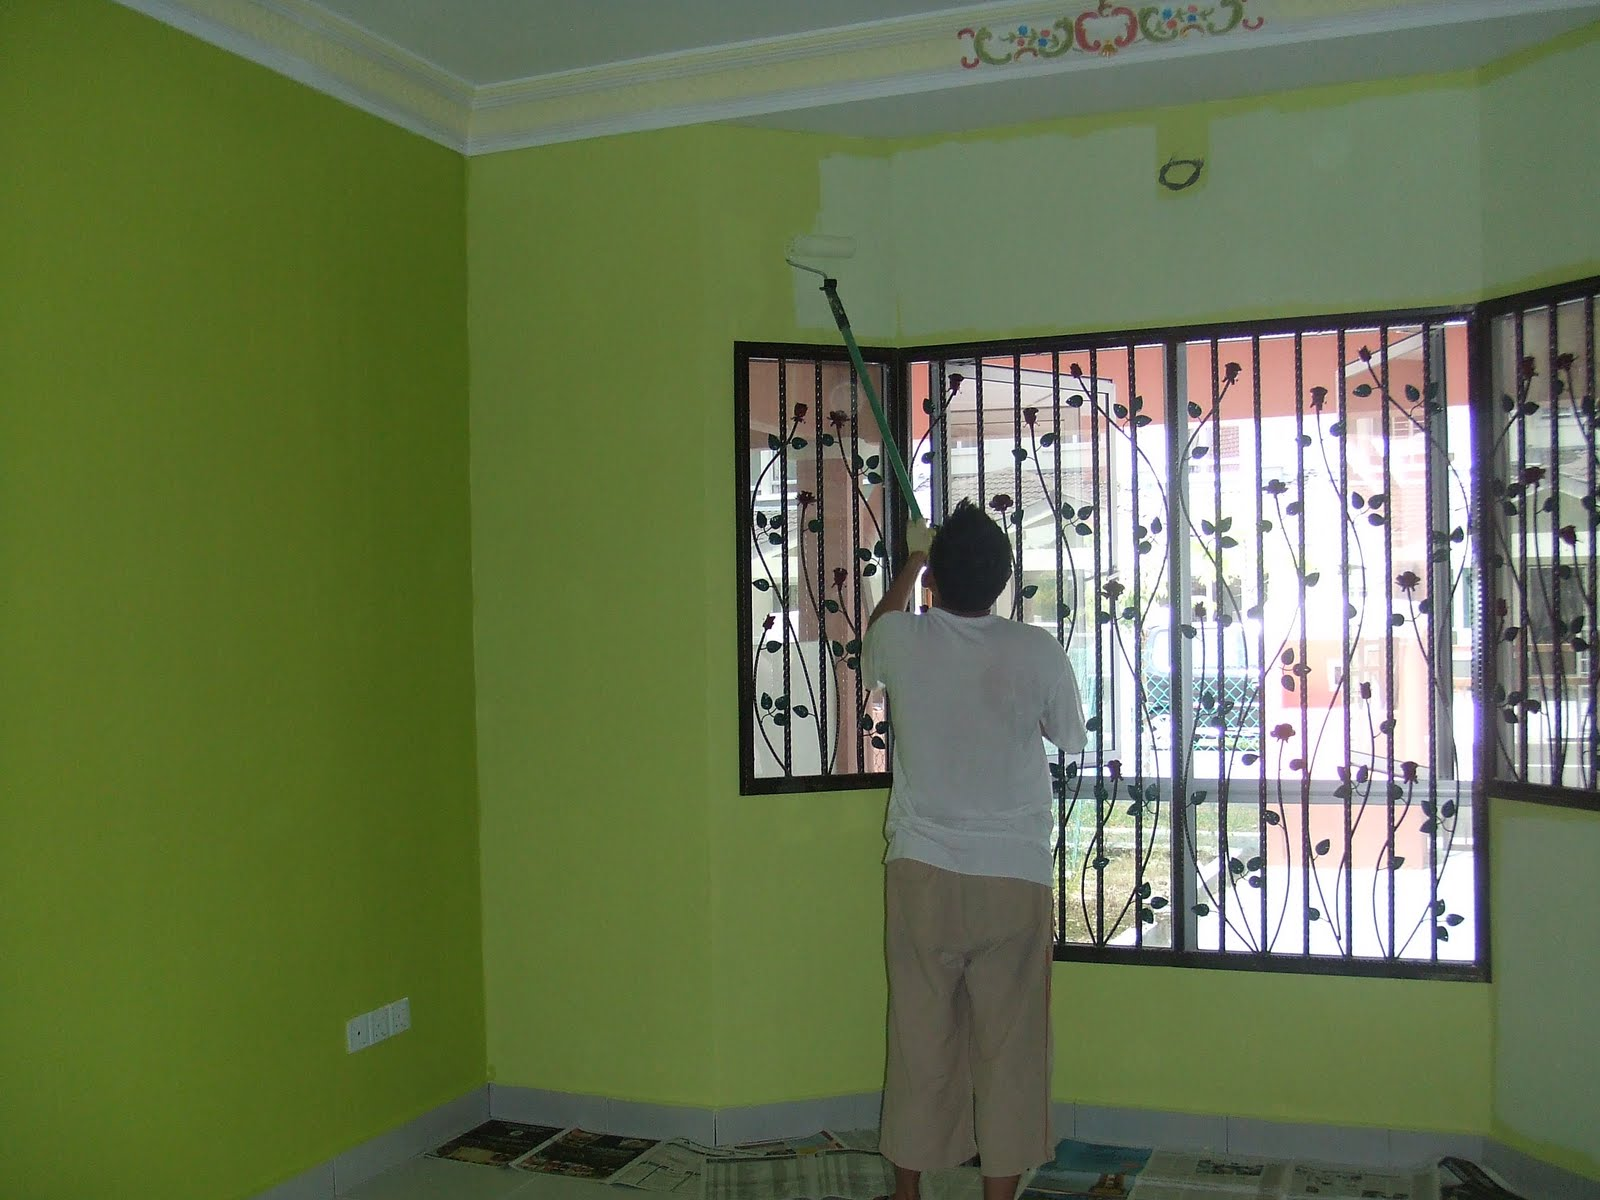 memilih gambar contoh kombinasi warna cat rumah kayu